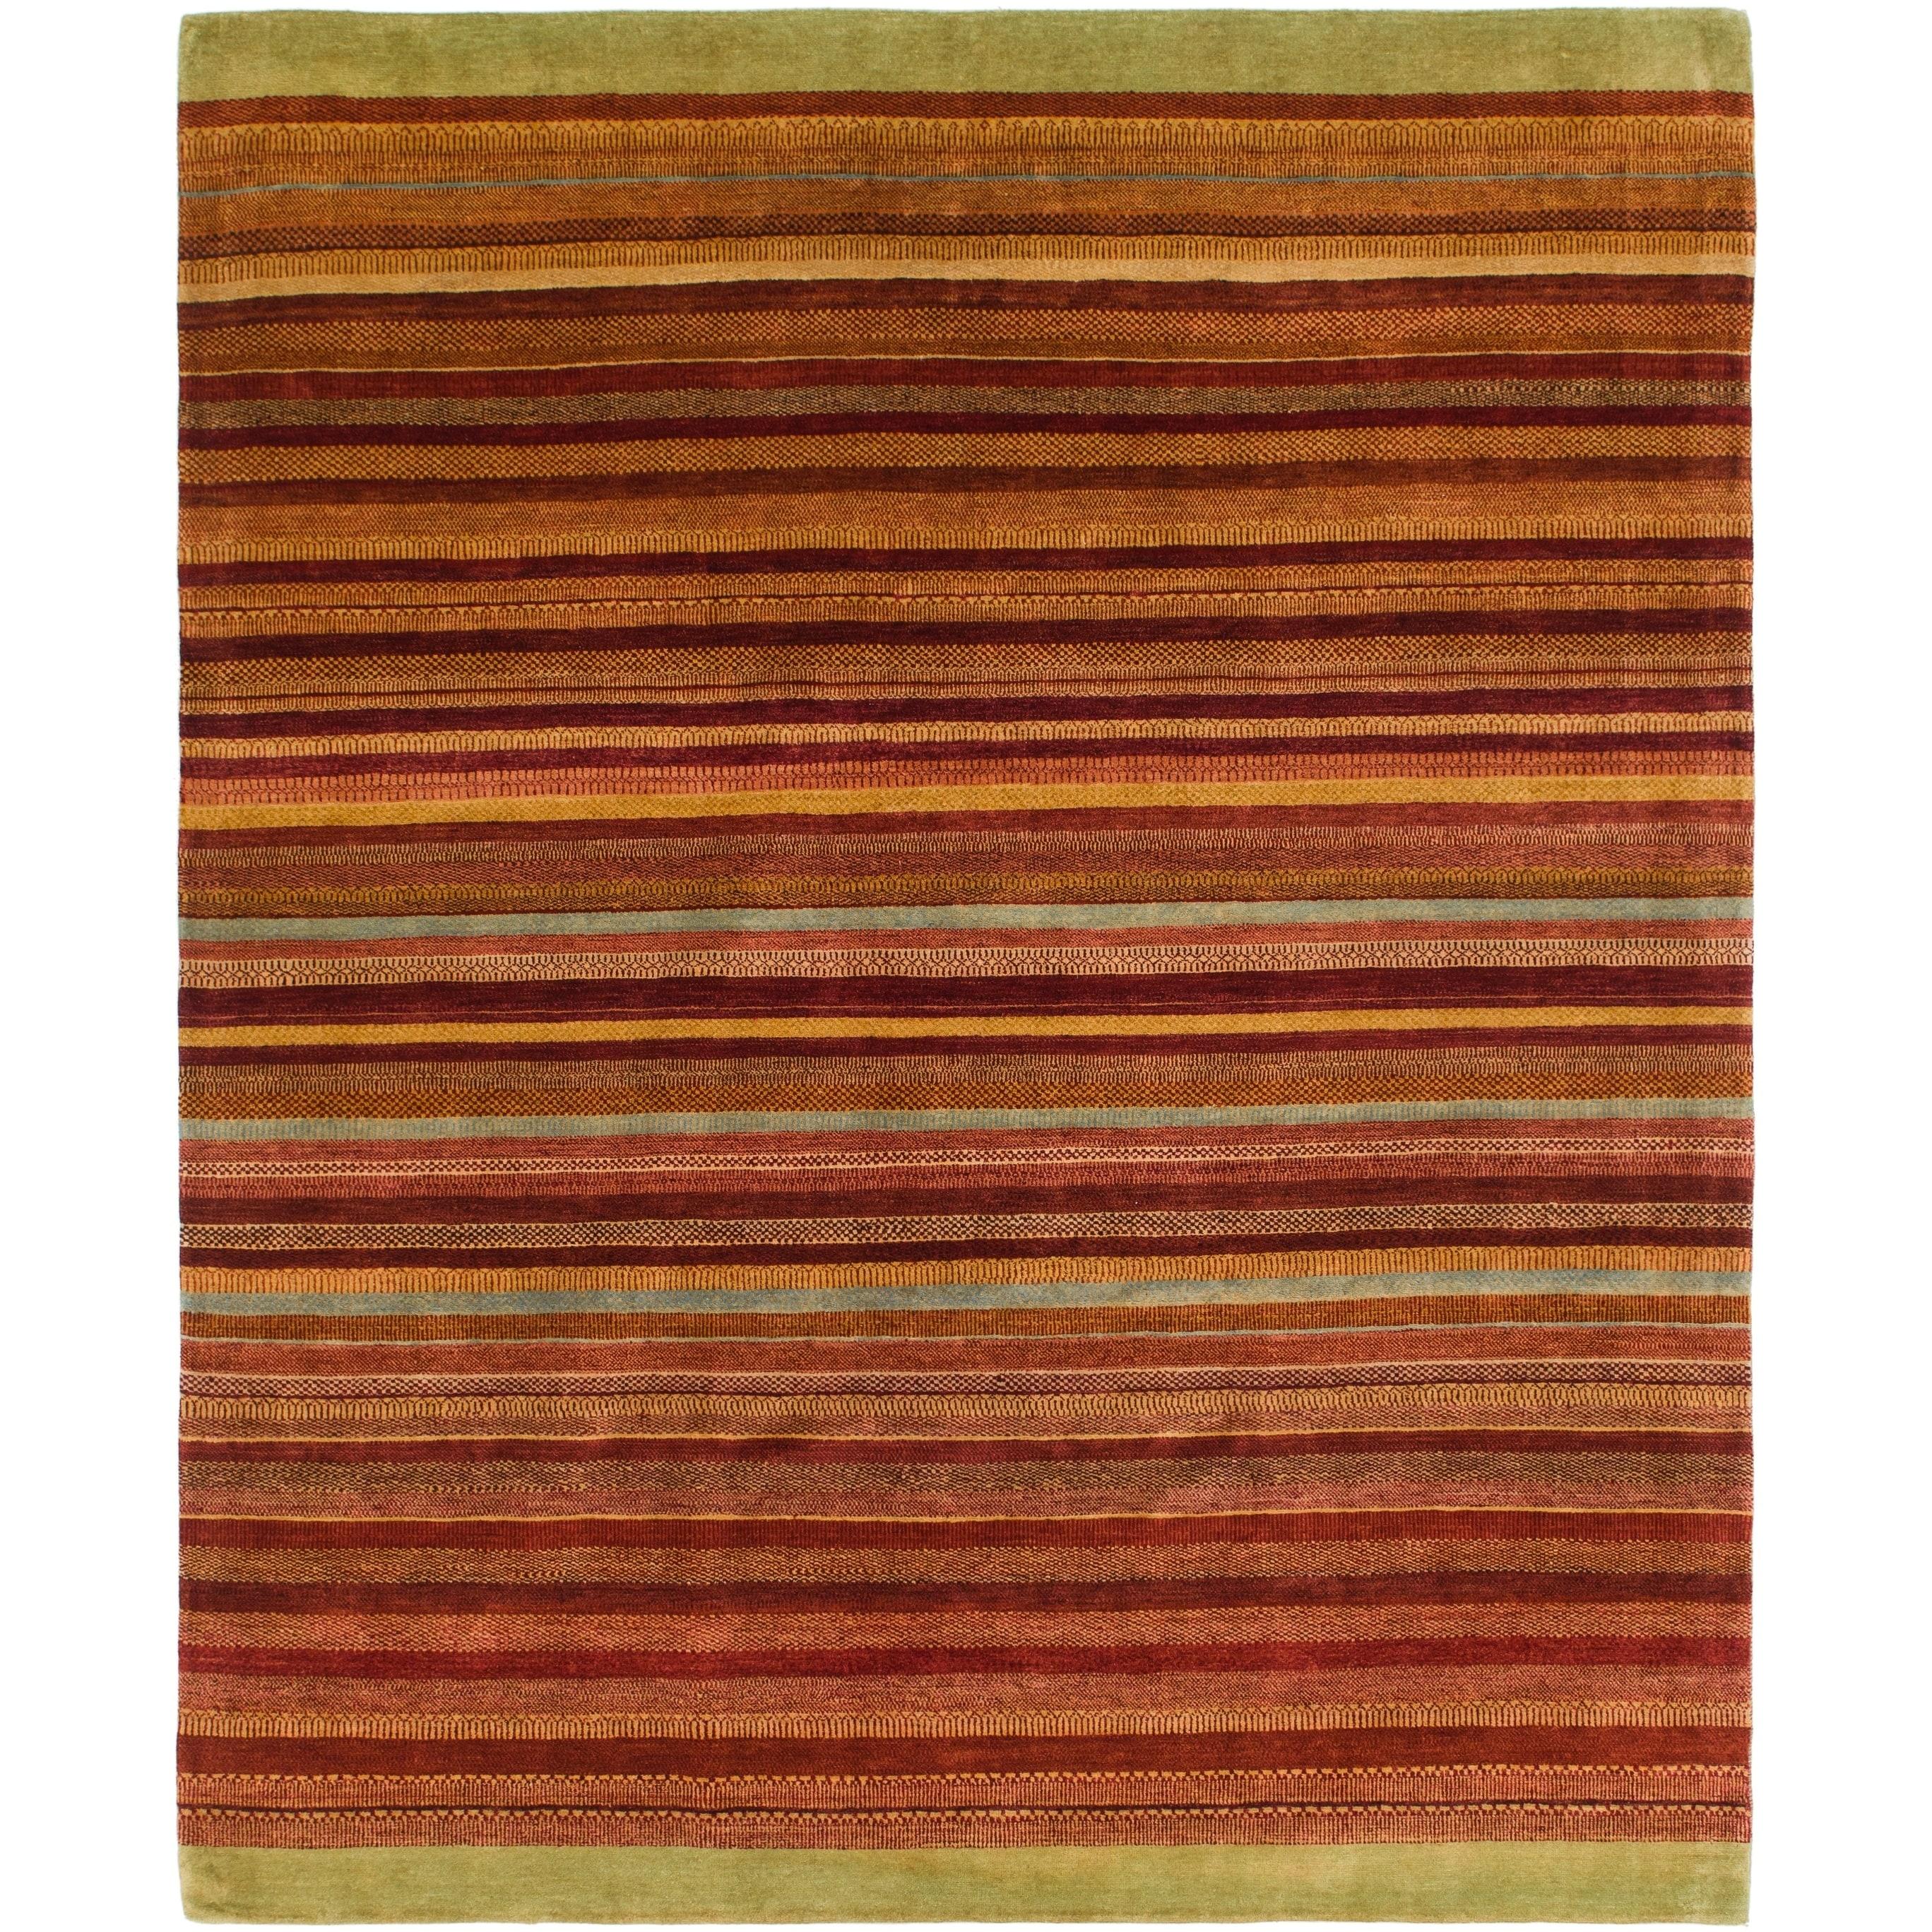 Hand Knotted Kashkuli Gabbeh Wool Area Rug - 8 x 9 10 (Multi - 8 x 9 10)